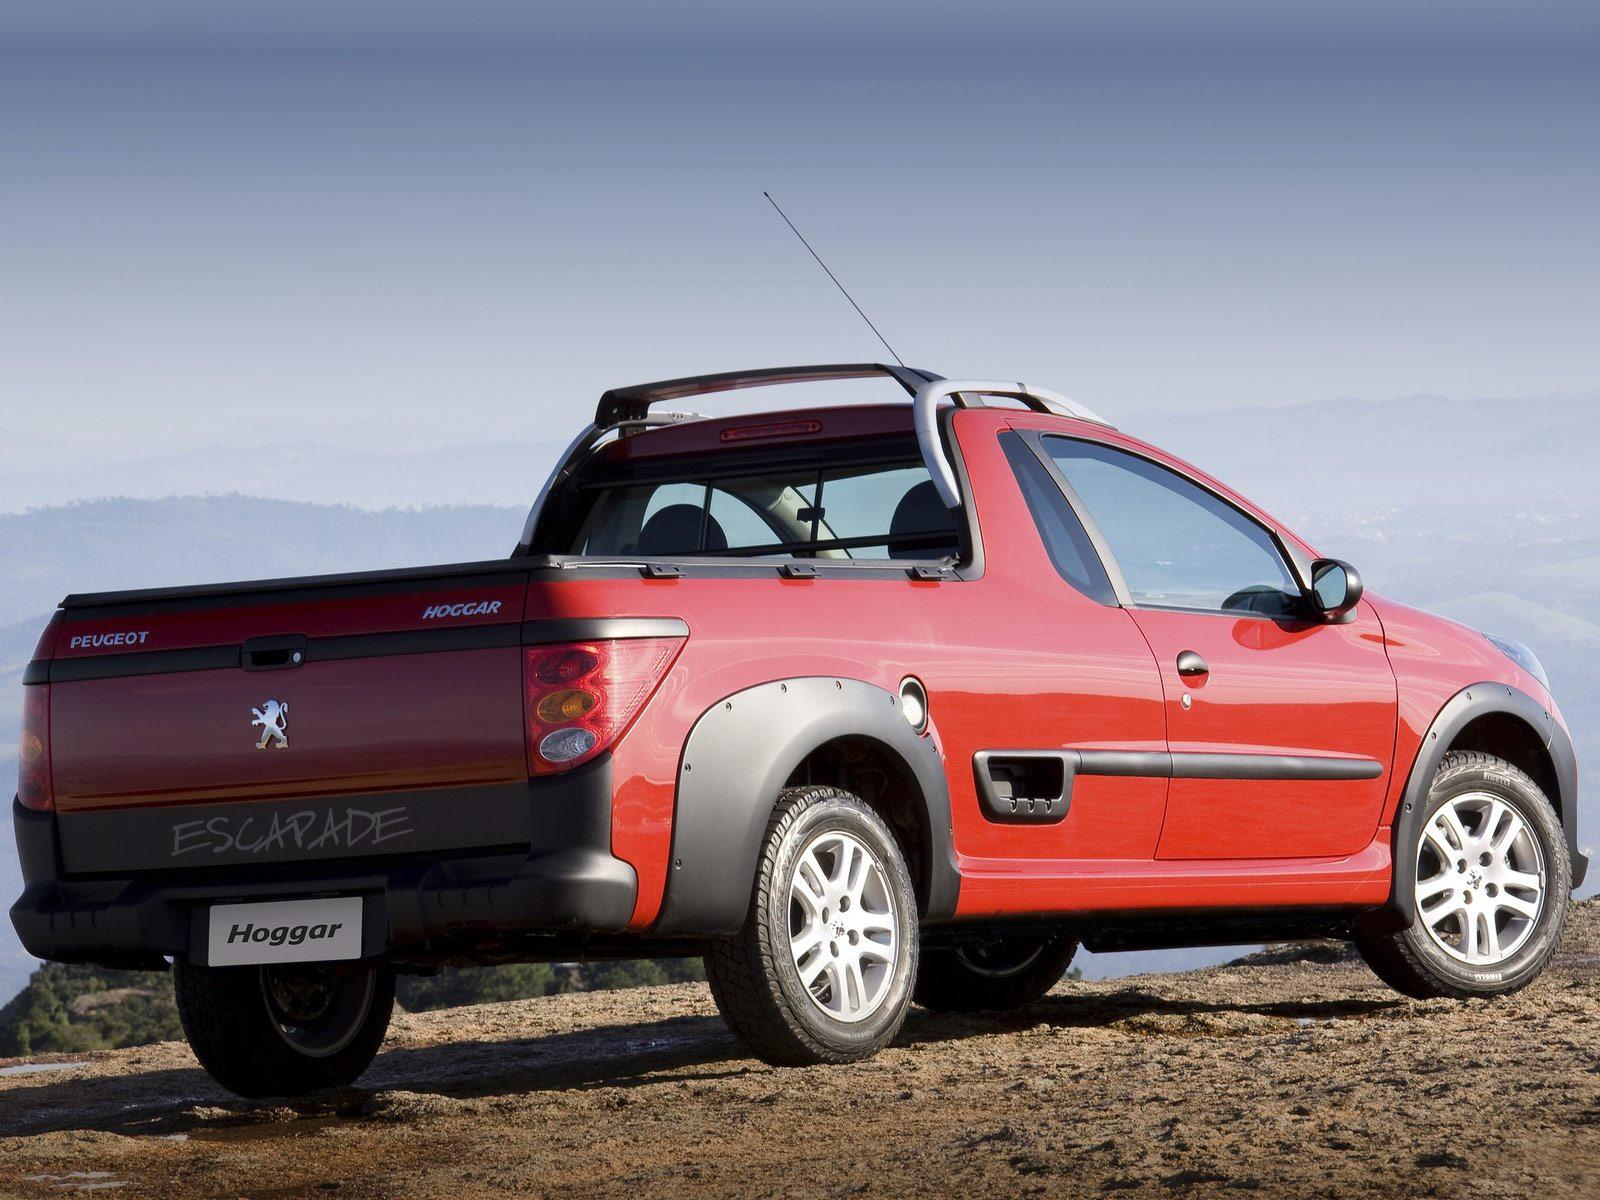 http://3.bp.blogspot.com/_DEP49tusZwg/TKQPnjOO13I/AAAAAAAABqE/MYzkRHDcCQI/s1600/Peugeot-Hoggar_2011_10.jpg